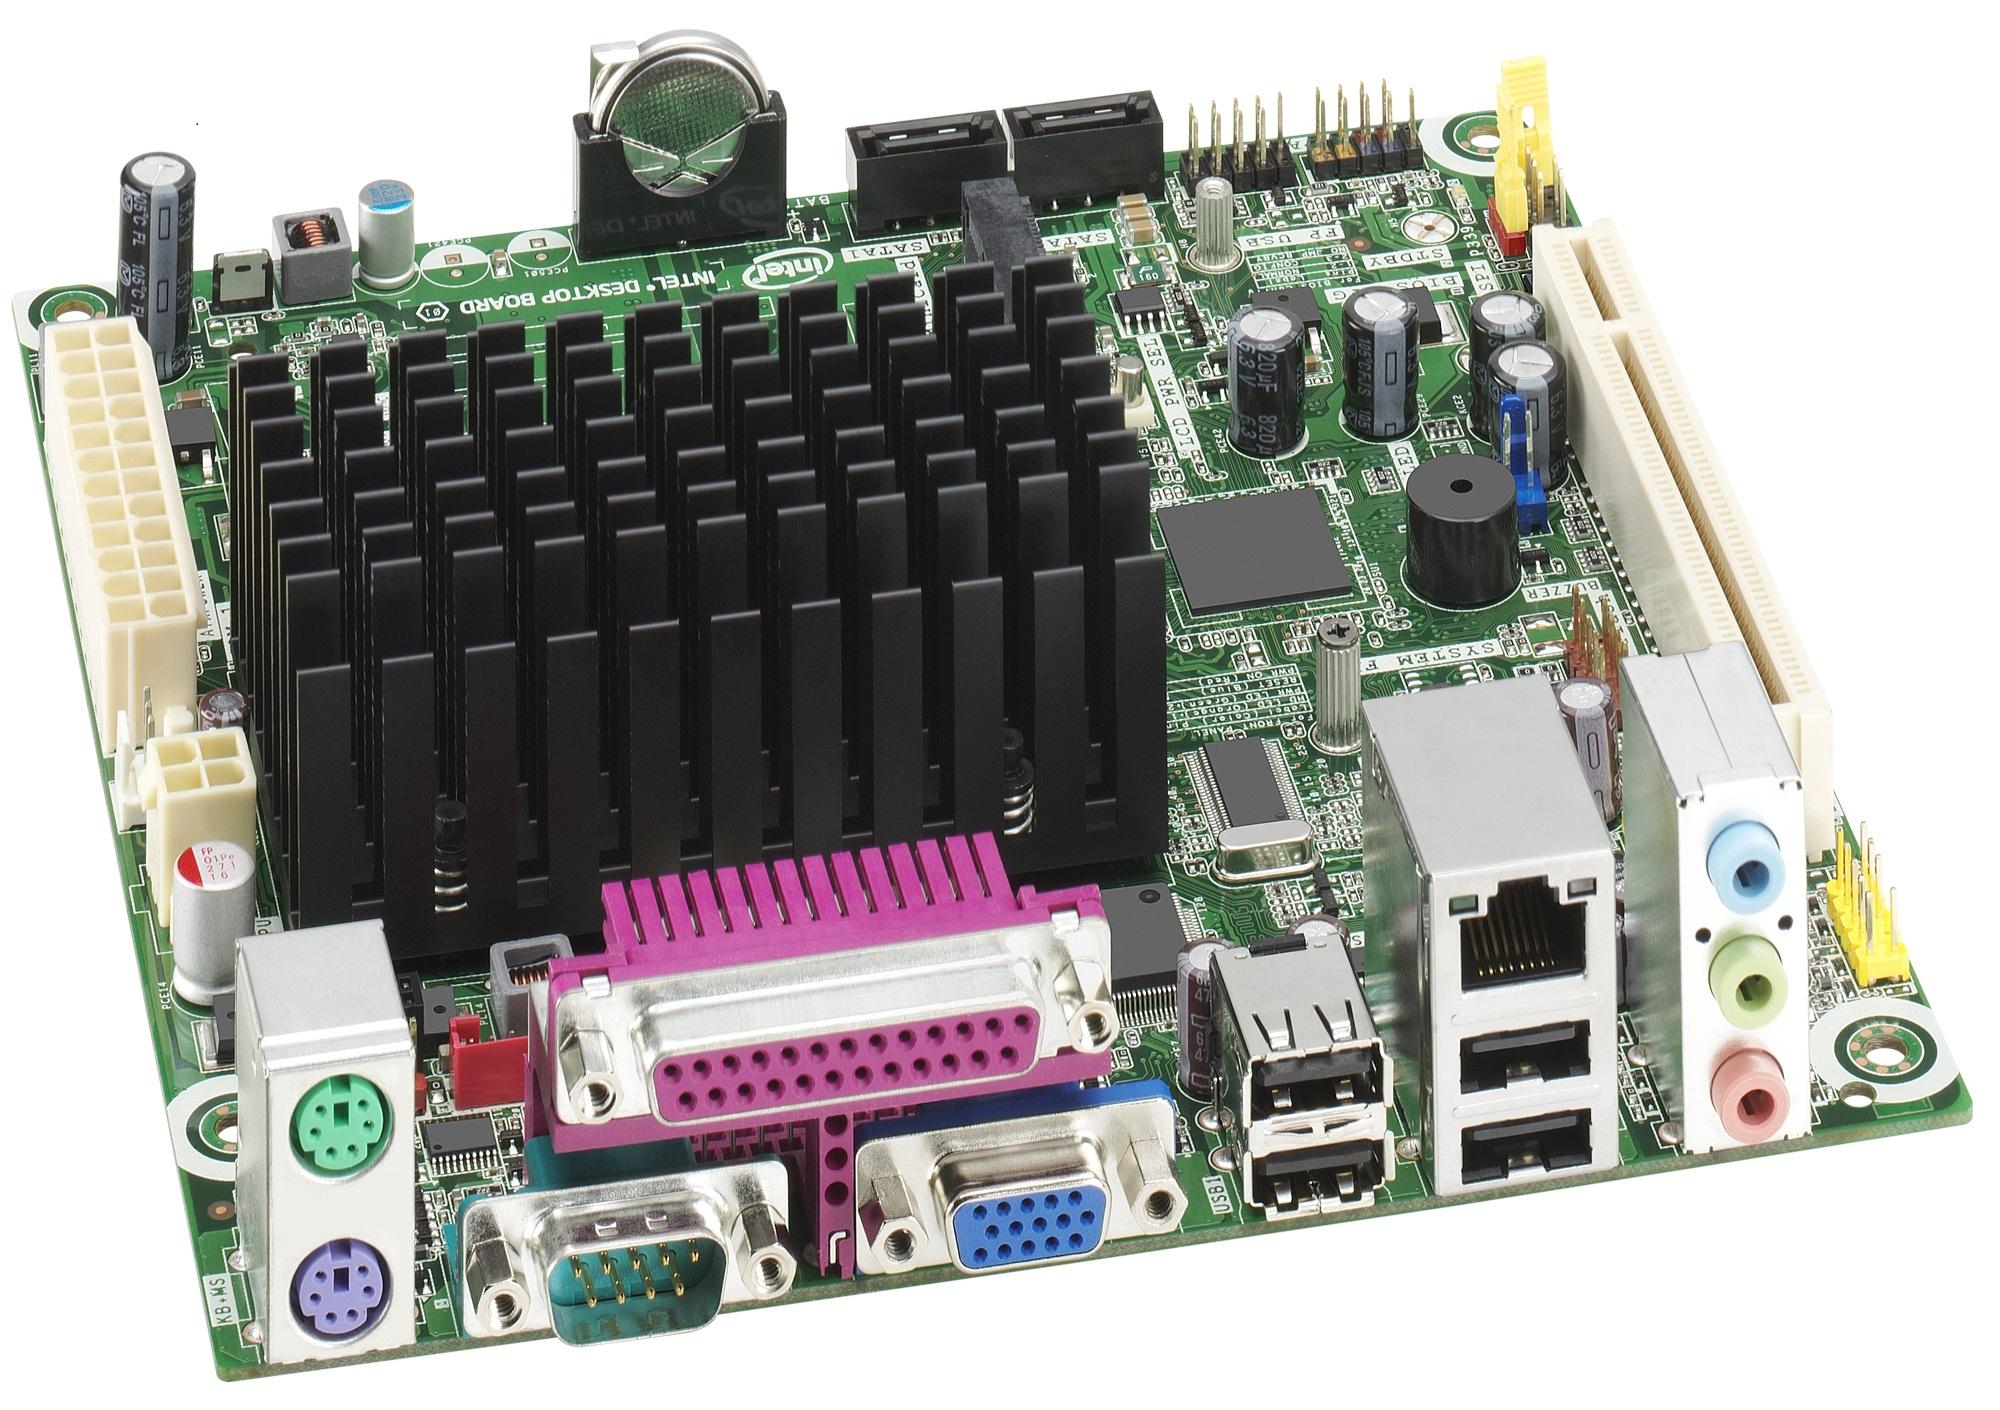 Intel MountWashington D525MWV: iNM10, Atom D525 (1,80), D-sub/LVDS, GLAN, miniITX